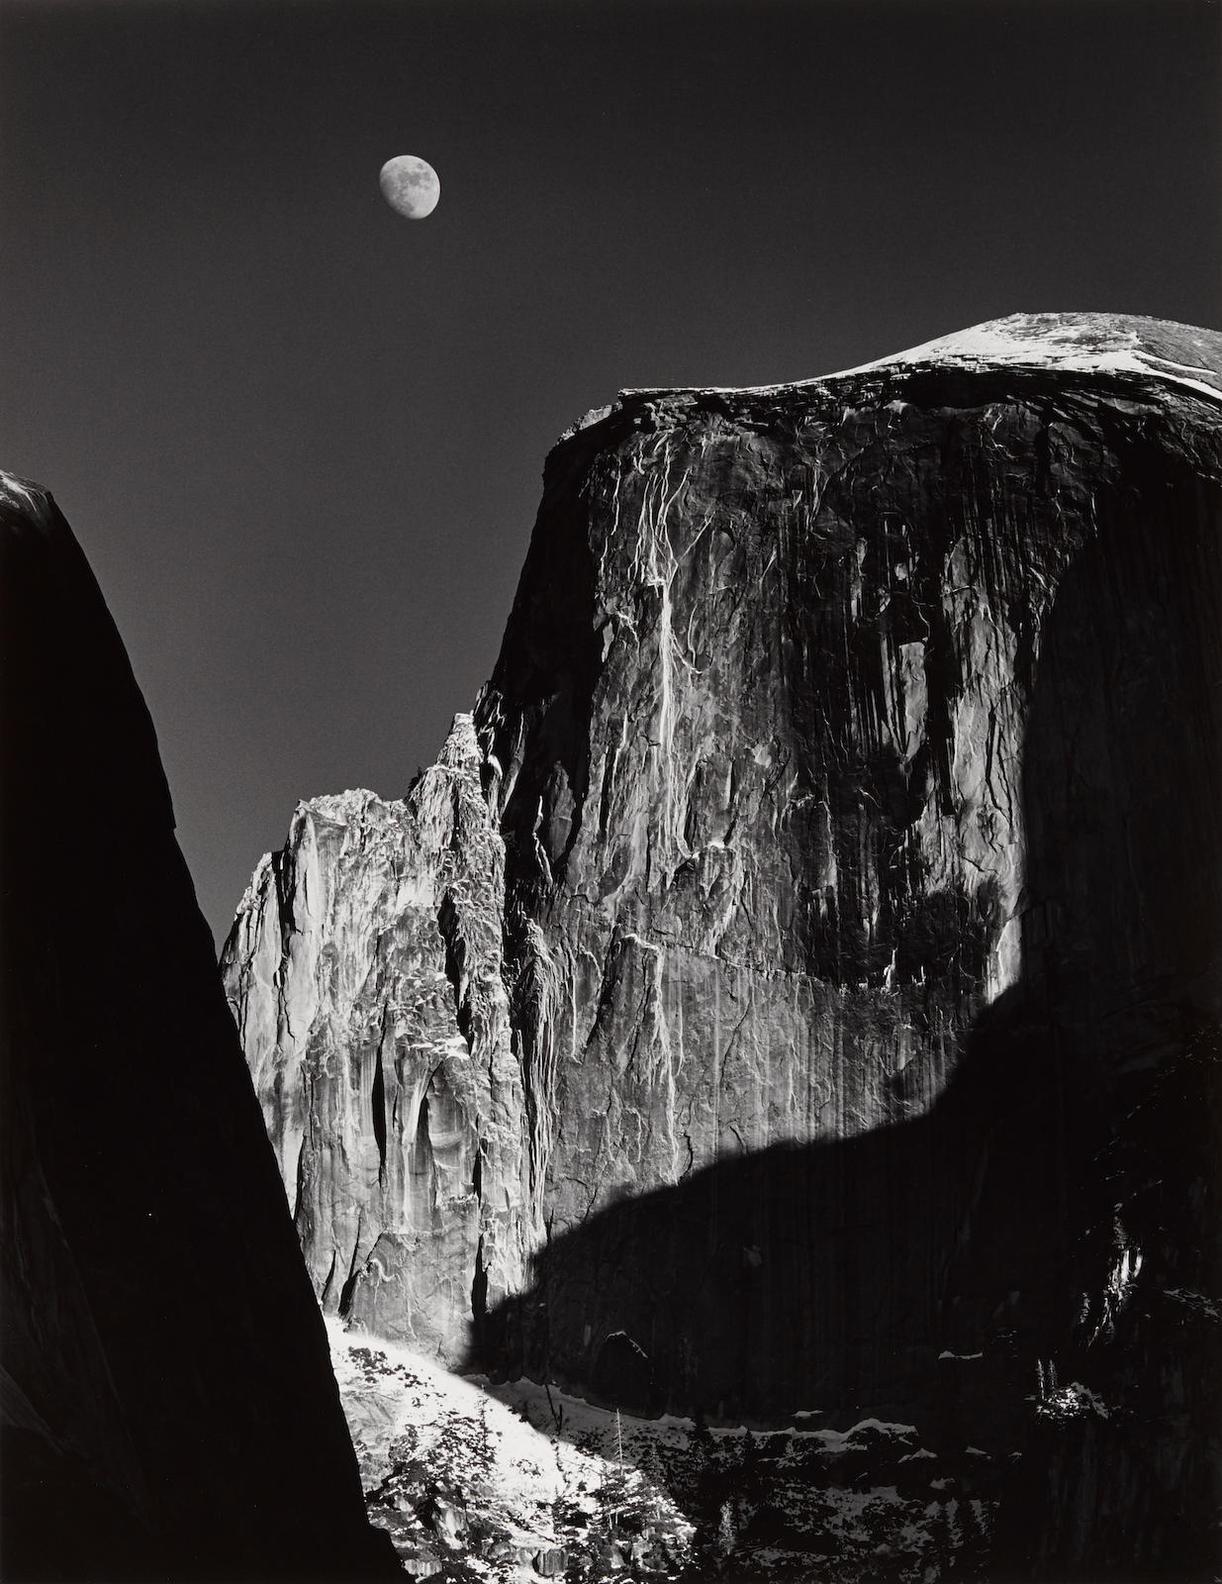 Ansel Adams-Moon And Half Dome, Yosemite National Park, Yosemite-1960